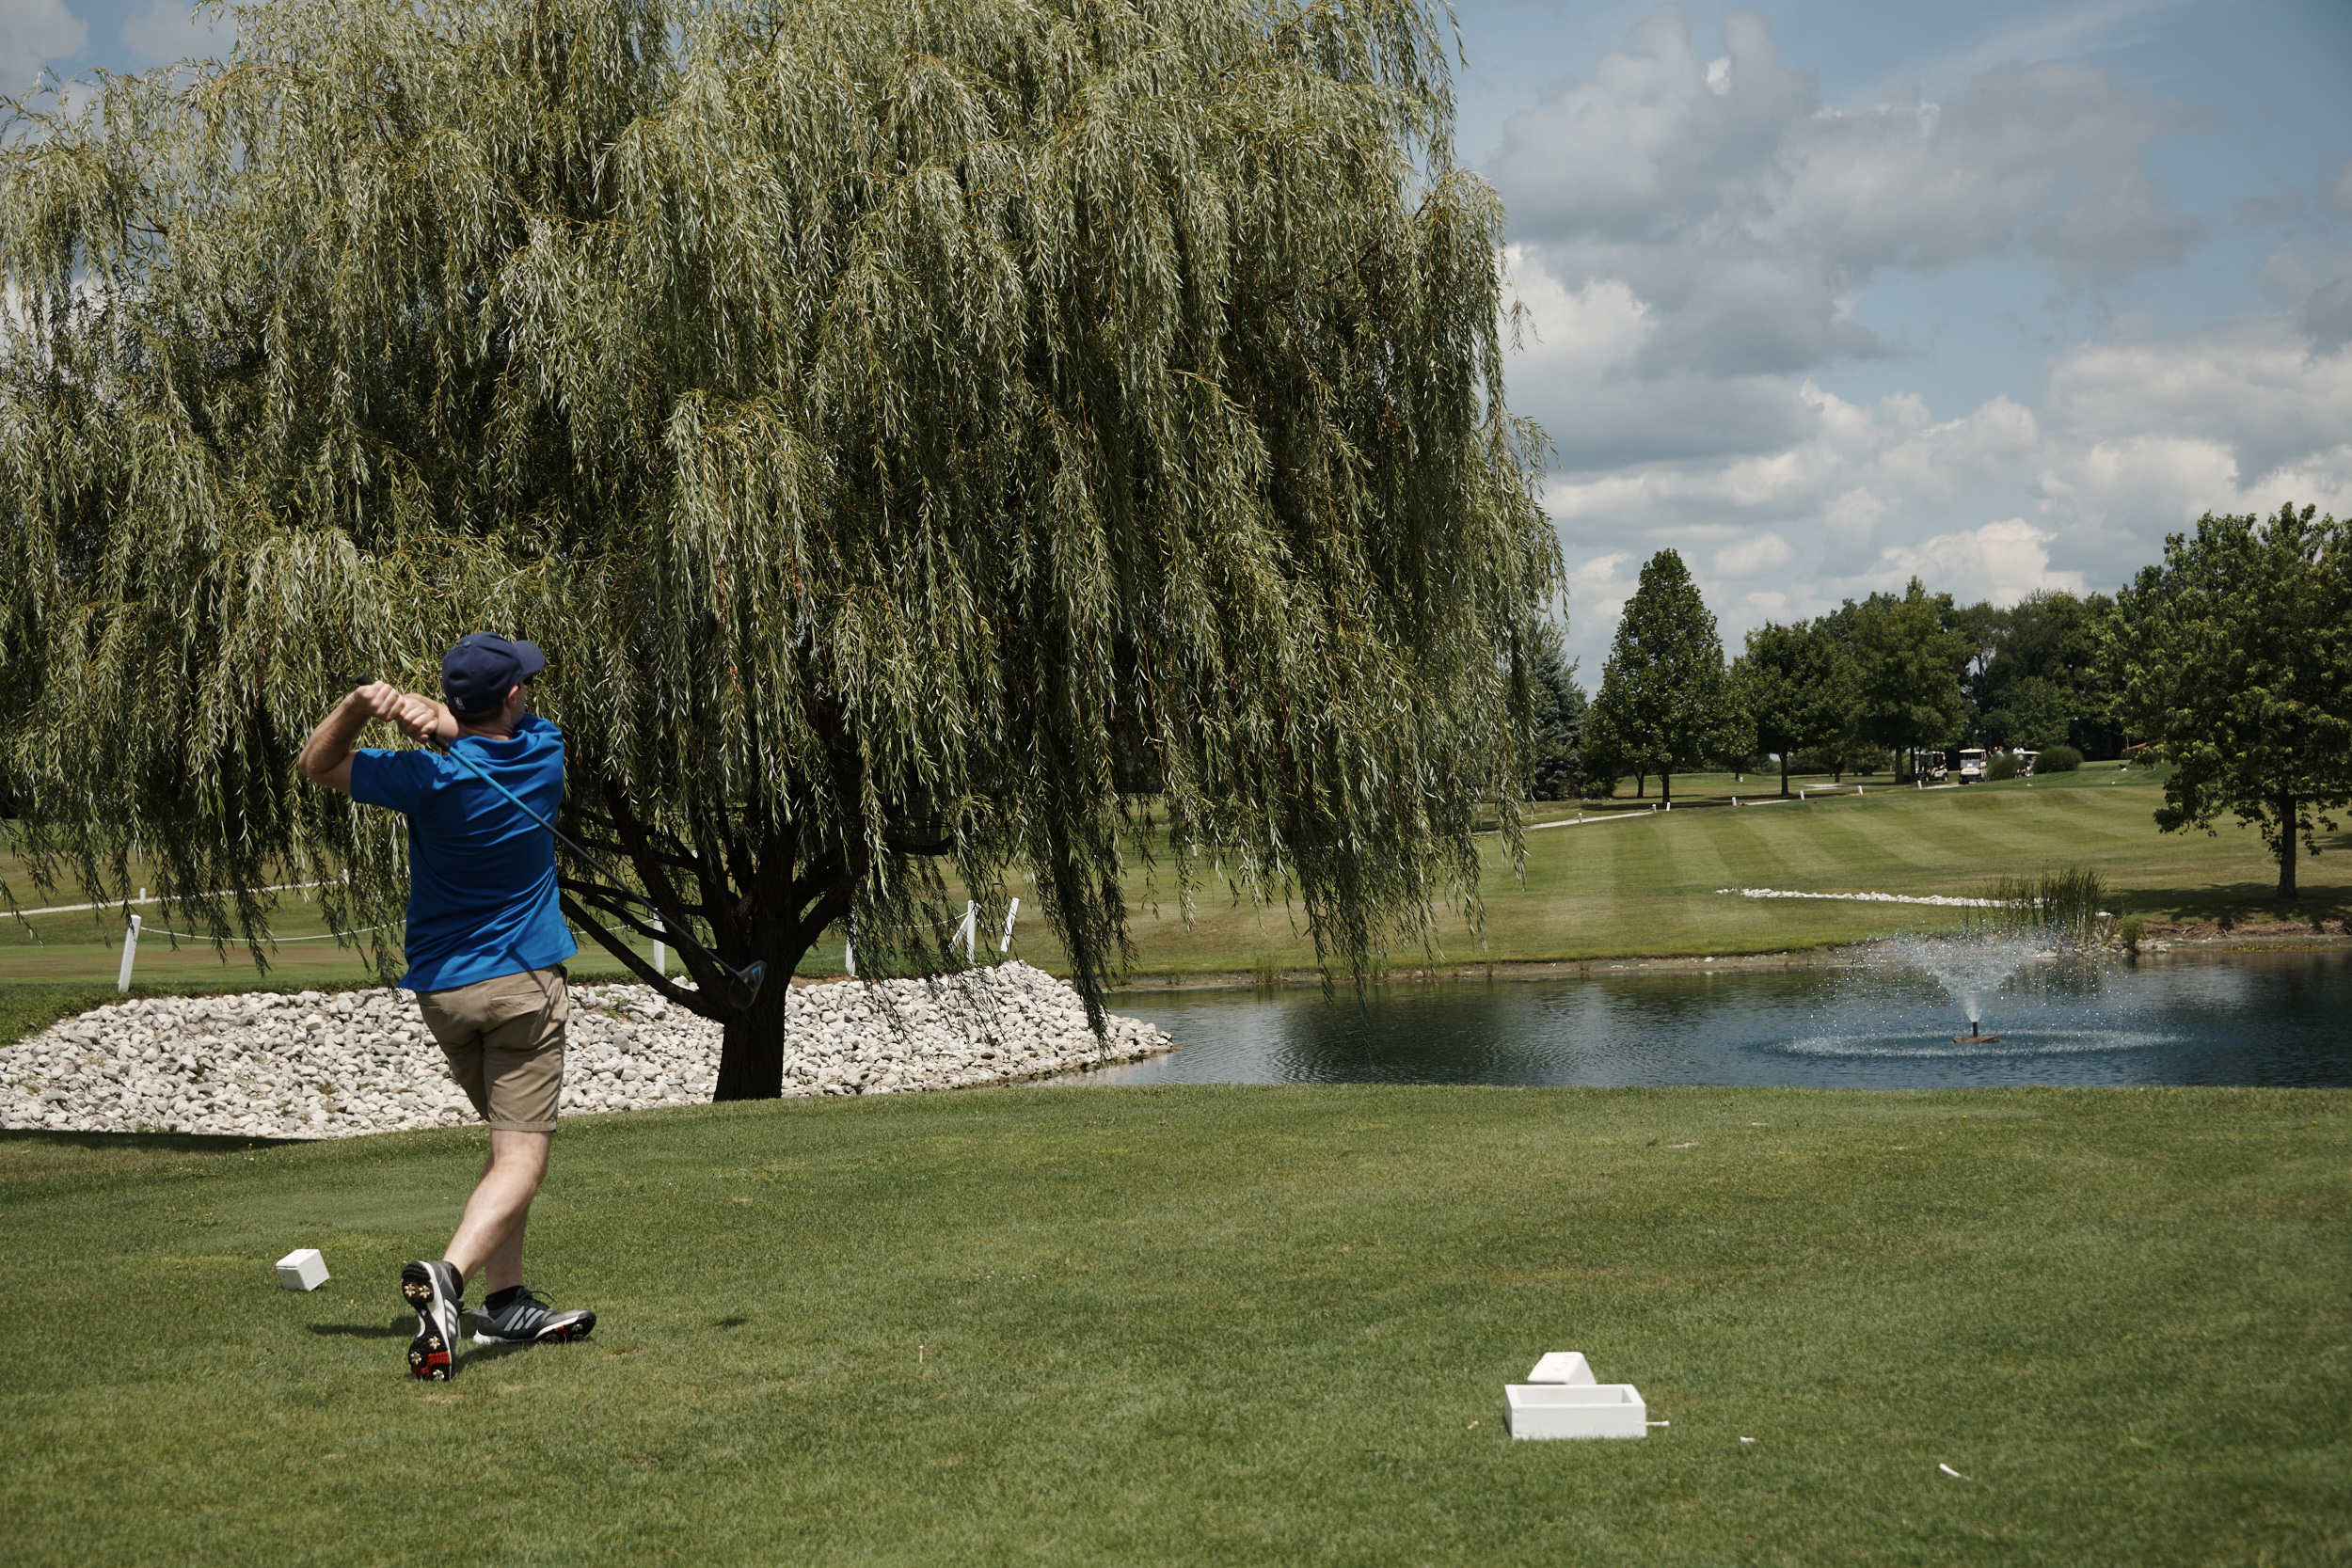 20180728 MTM Golf Outing - Tim Schumm Photography 011.jpg